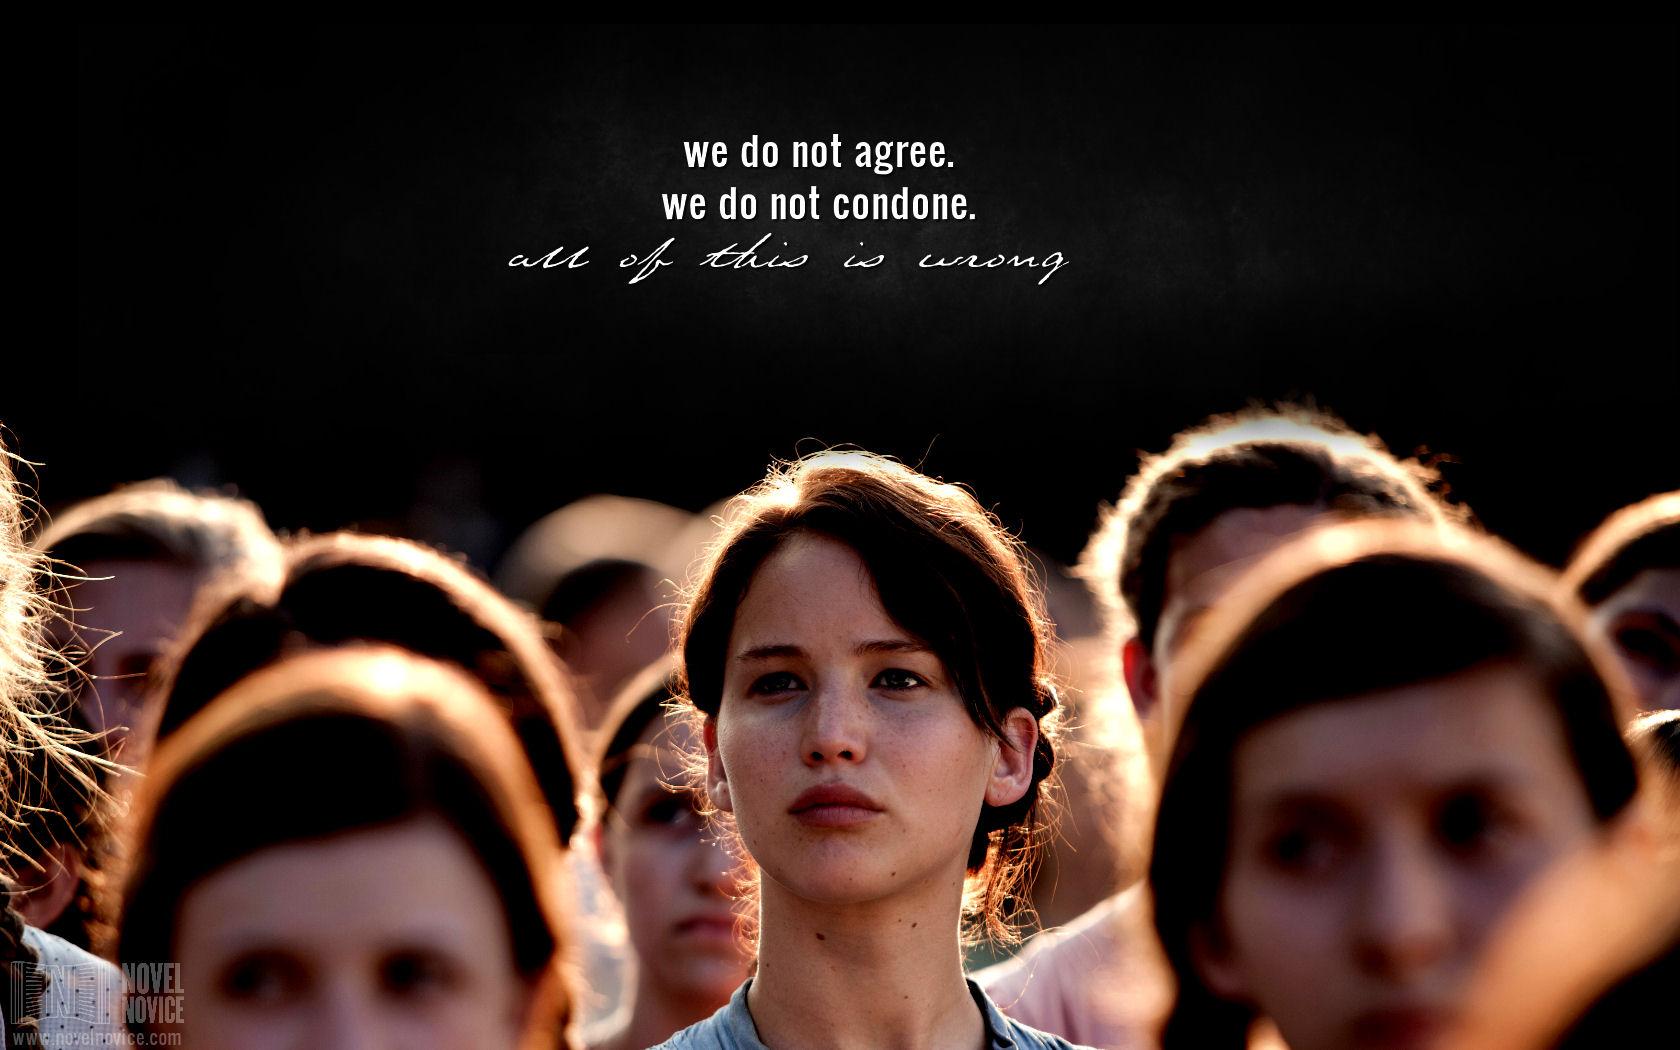 The Hunger Games Movie Desktop Wallpapers Part 2   Novel Novice 1680x1050